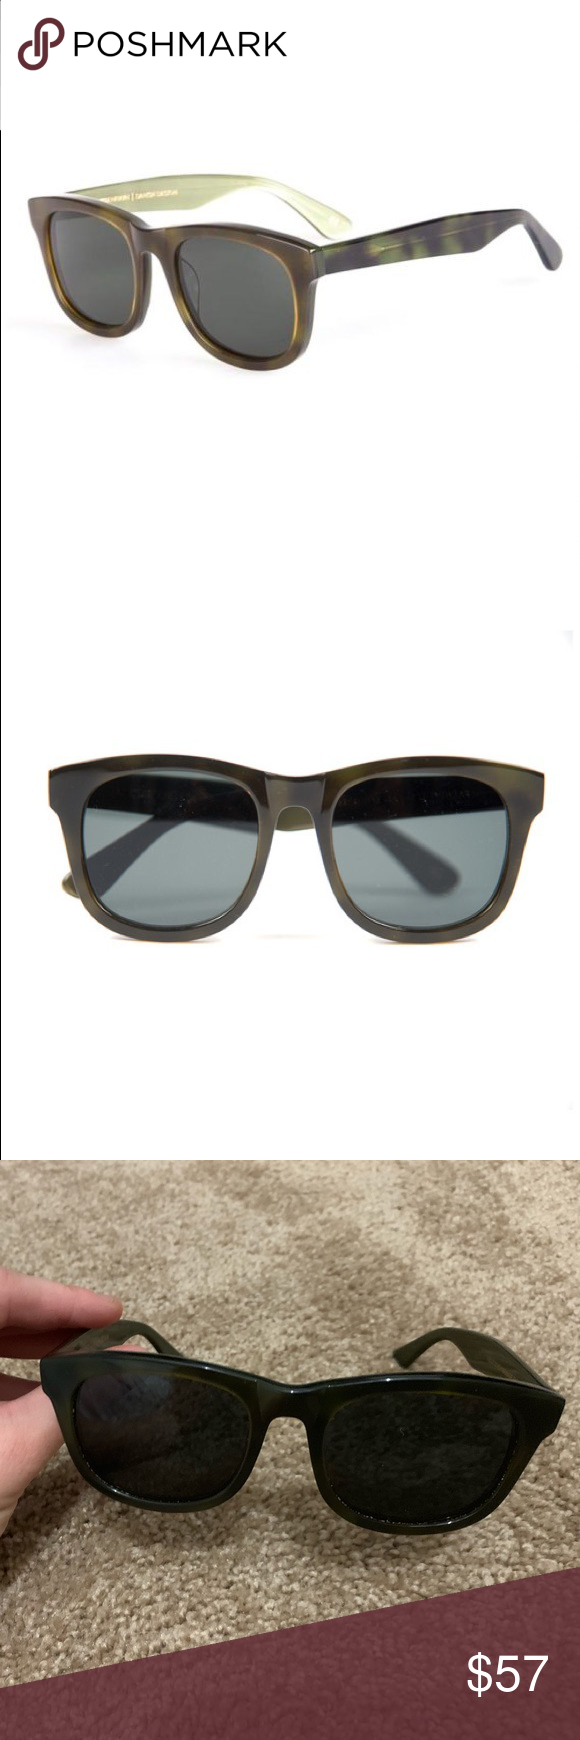 a79412bf61d Han Kjobenhavn Wolfgang Mash Sunglasses in 2018